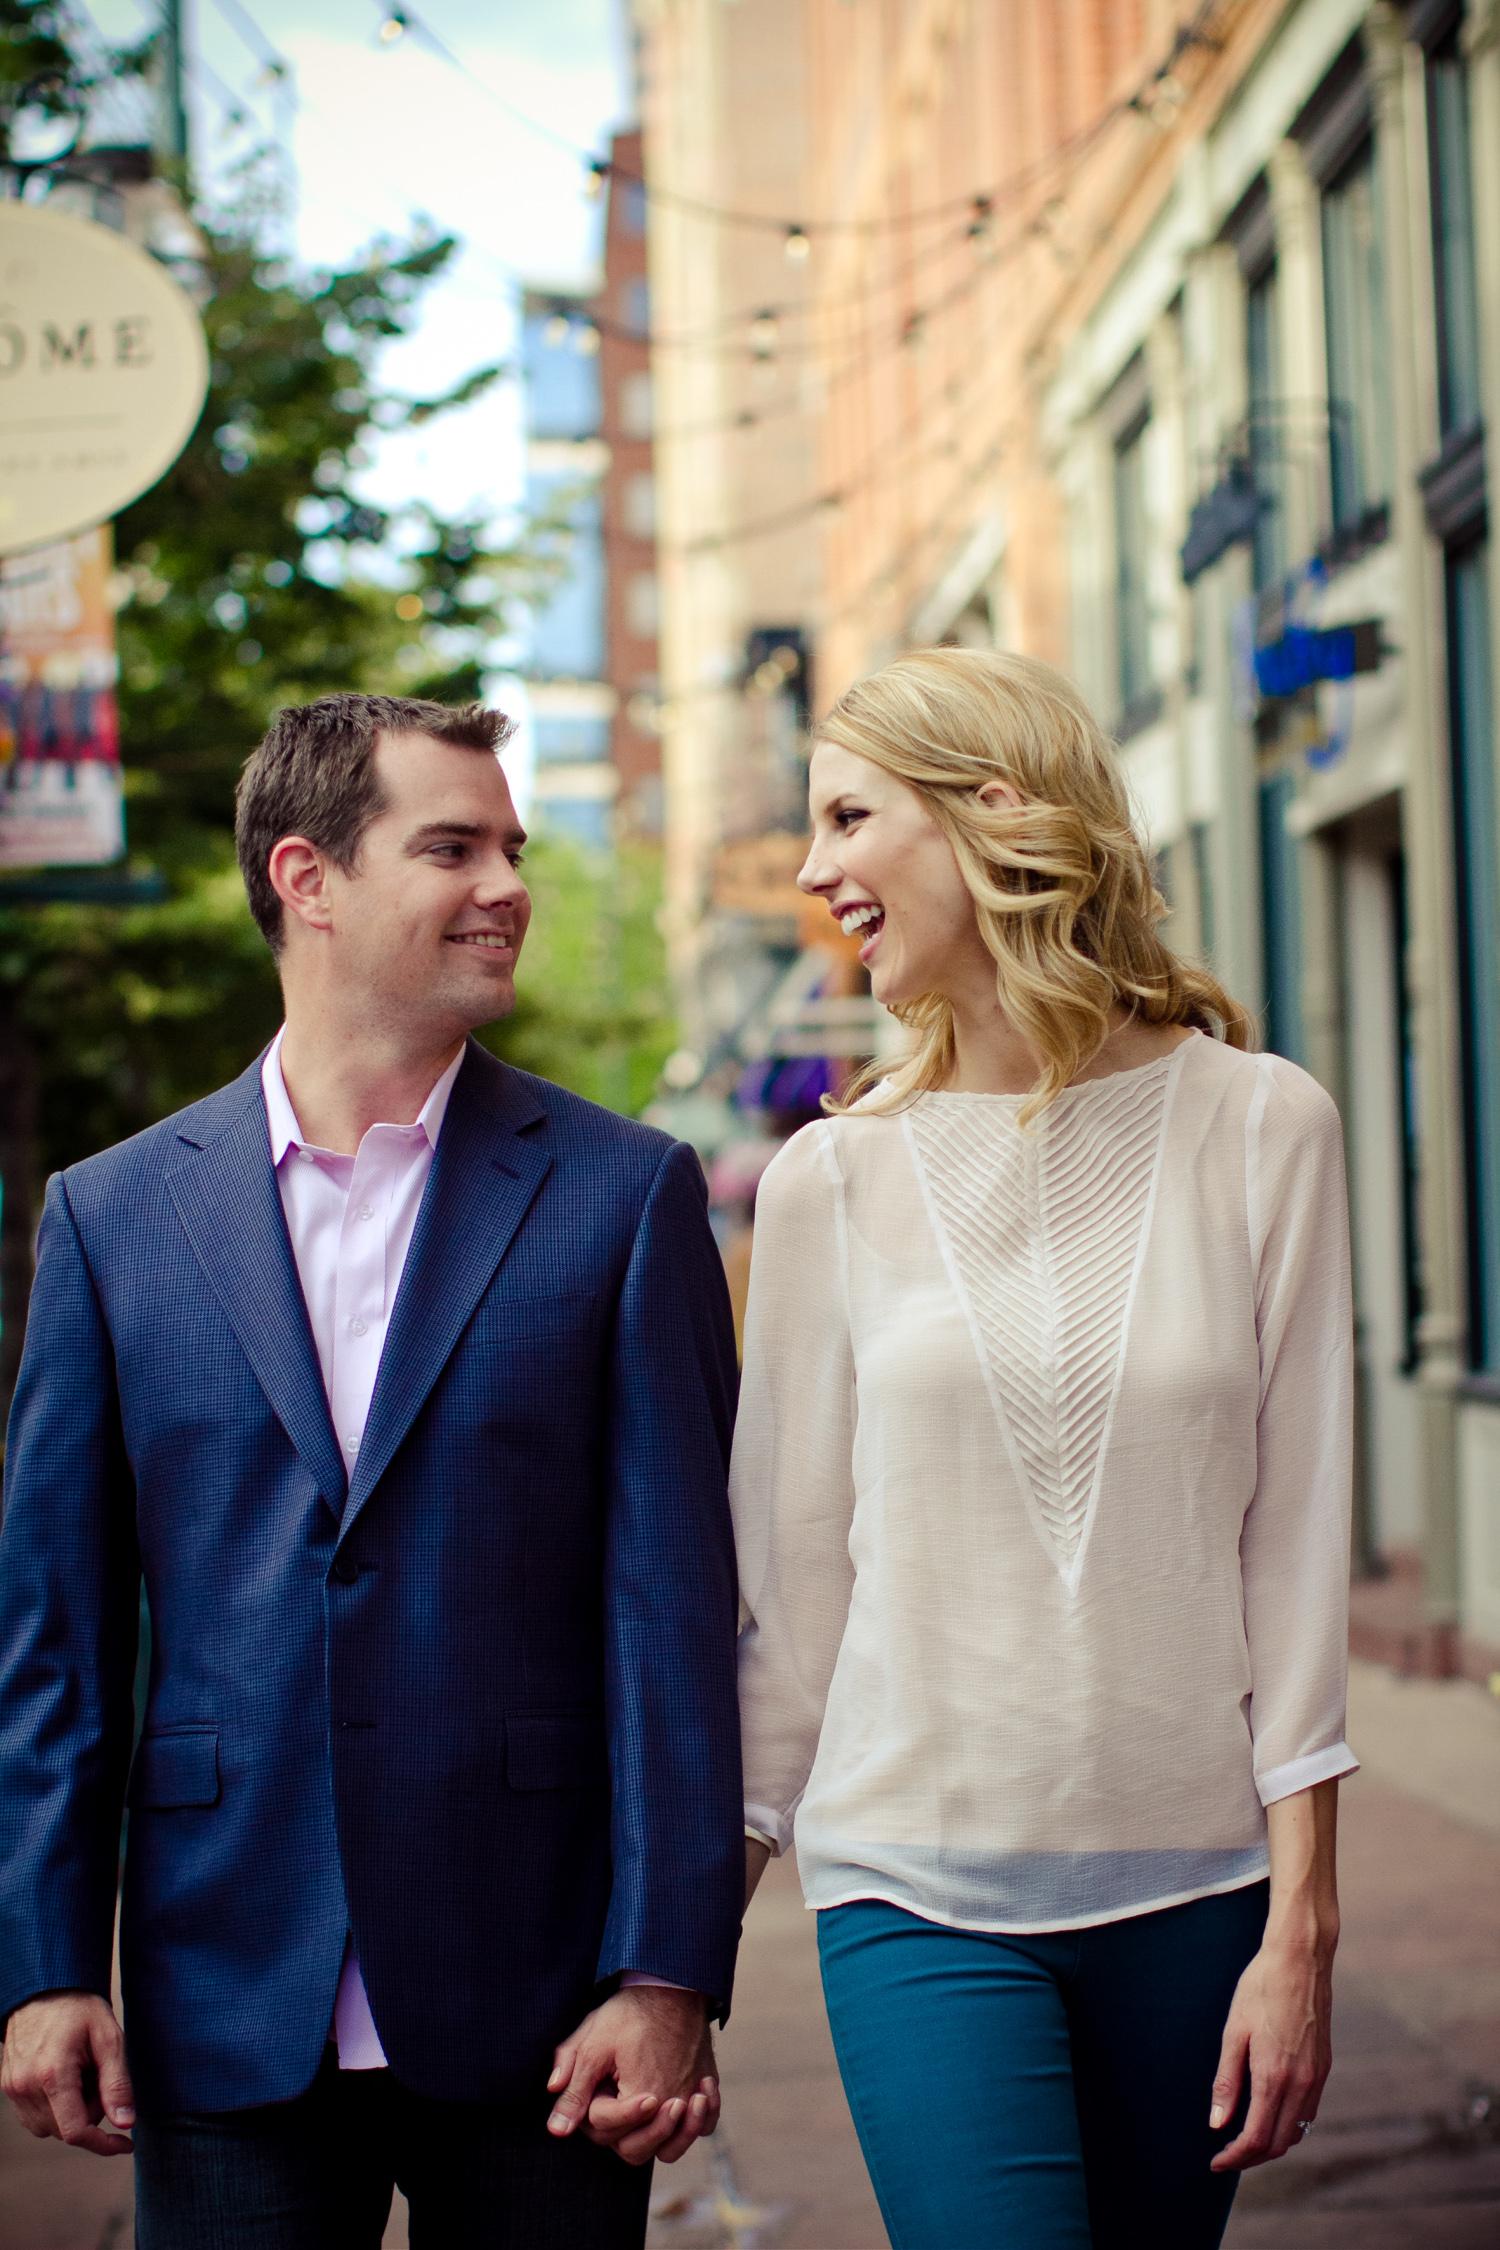 Downtown_Denver_Engagement_Photos_022.JPG